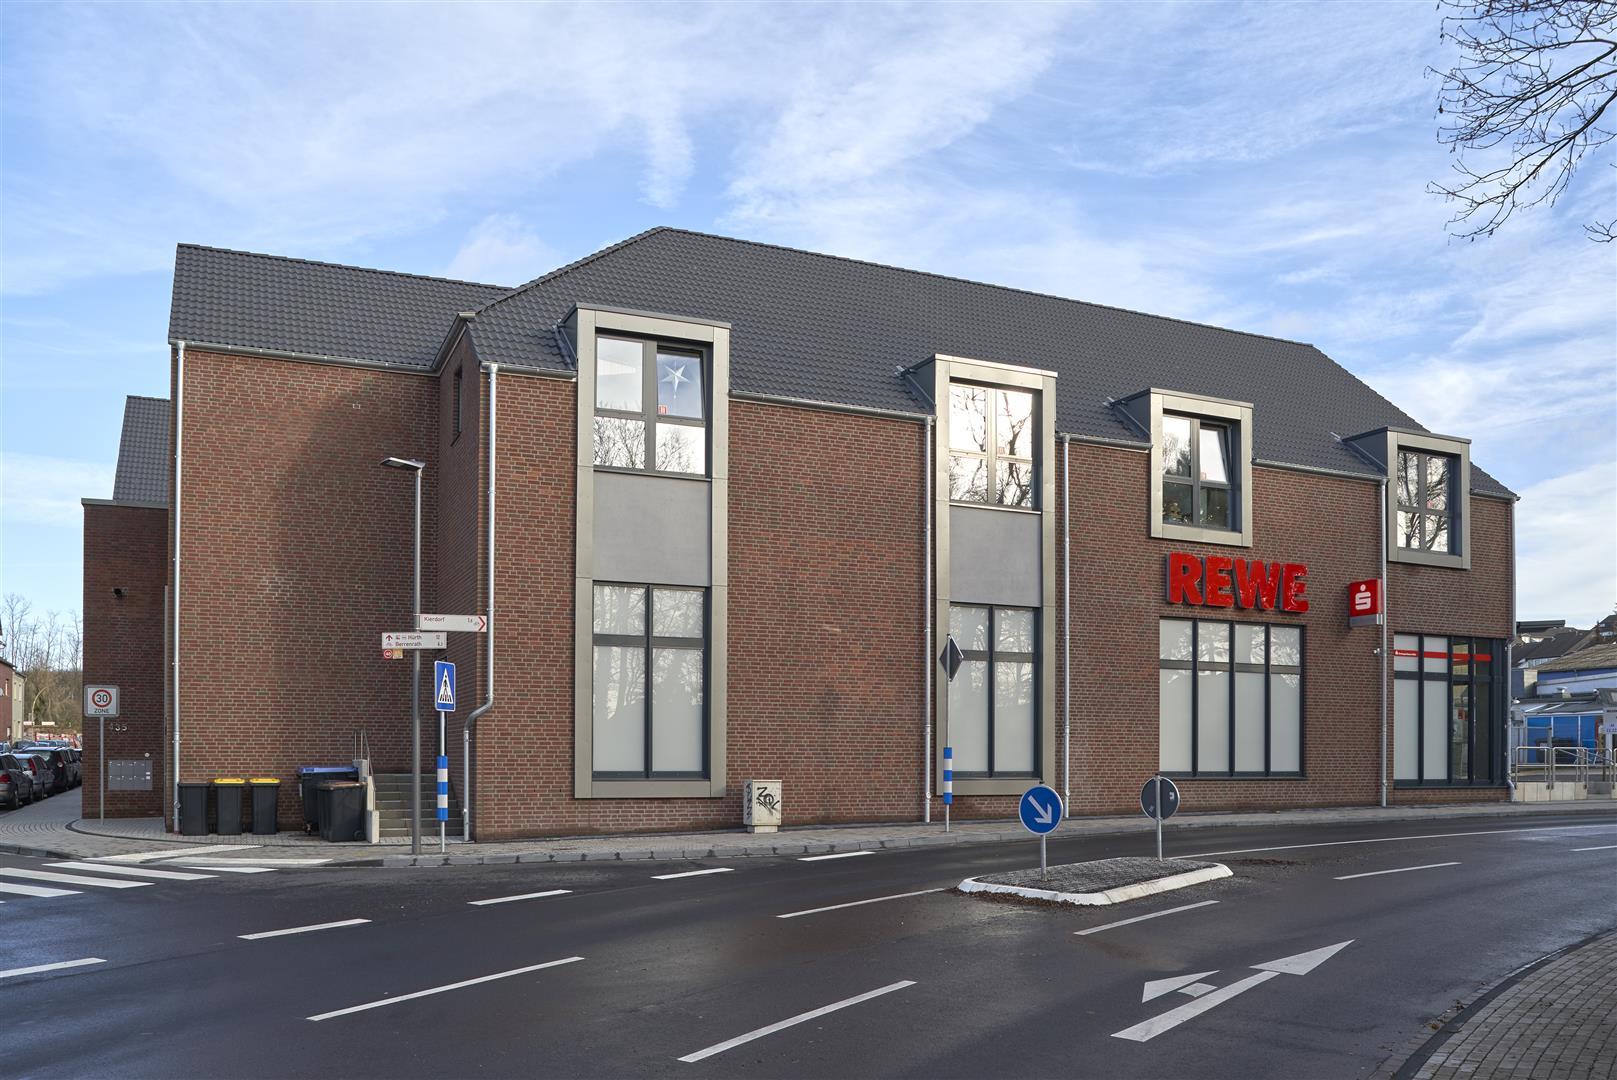 Neunkirchen seelscheid neubau rewe REWE Prospekt